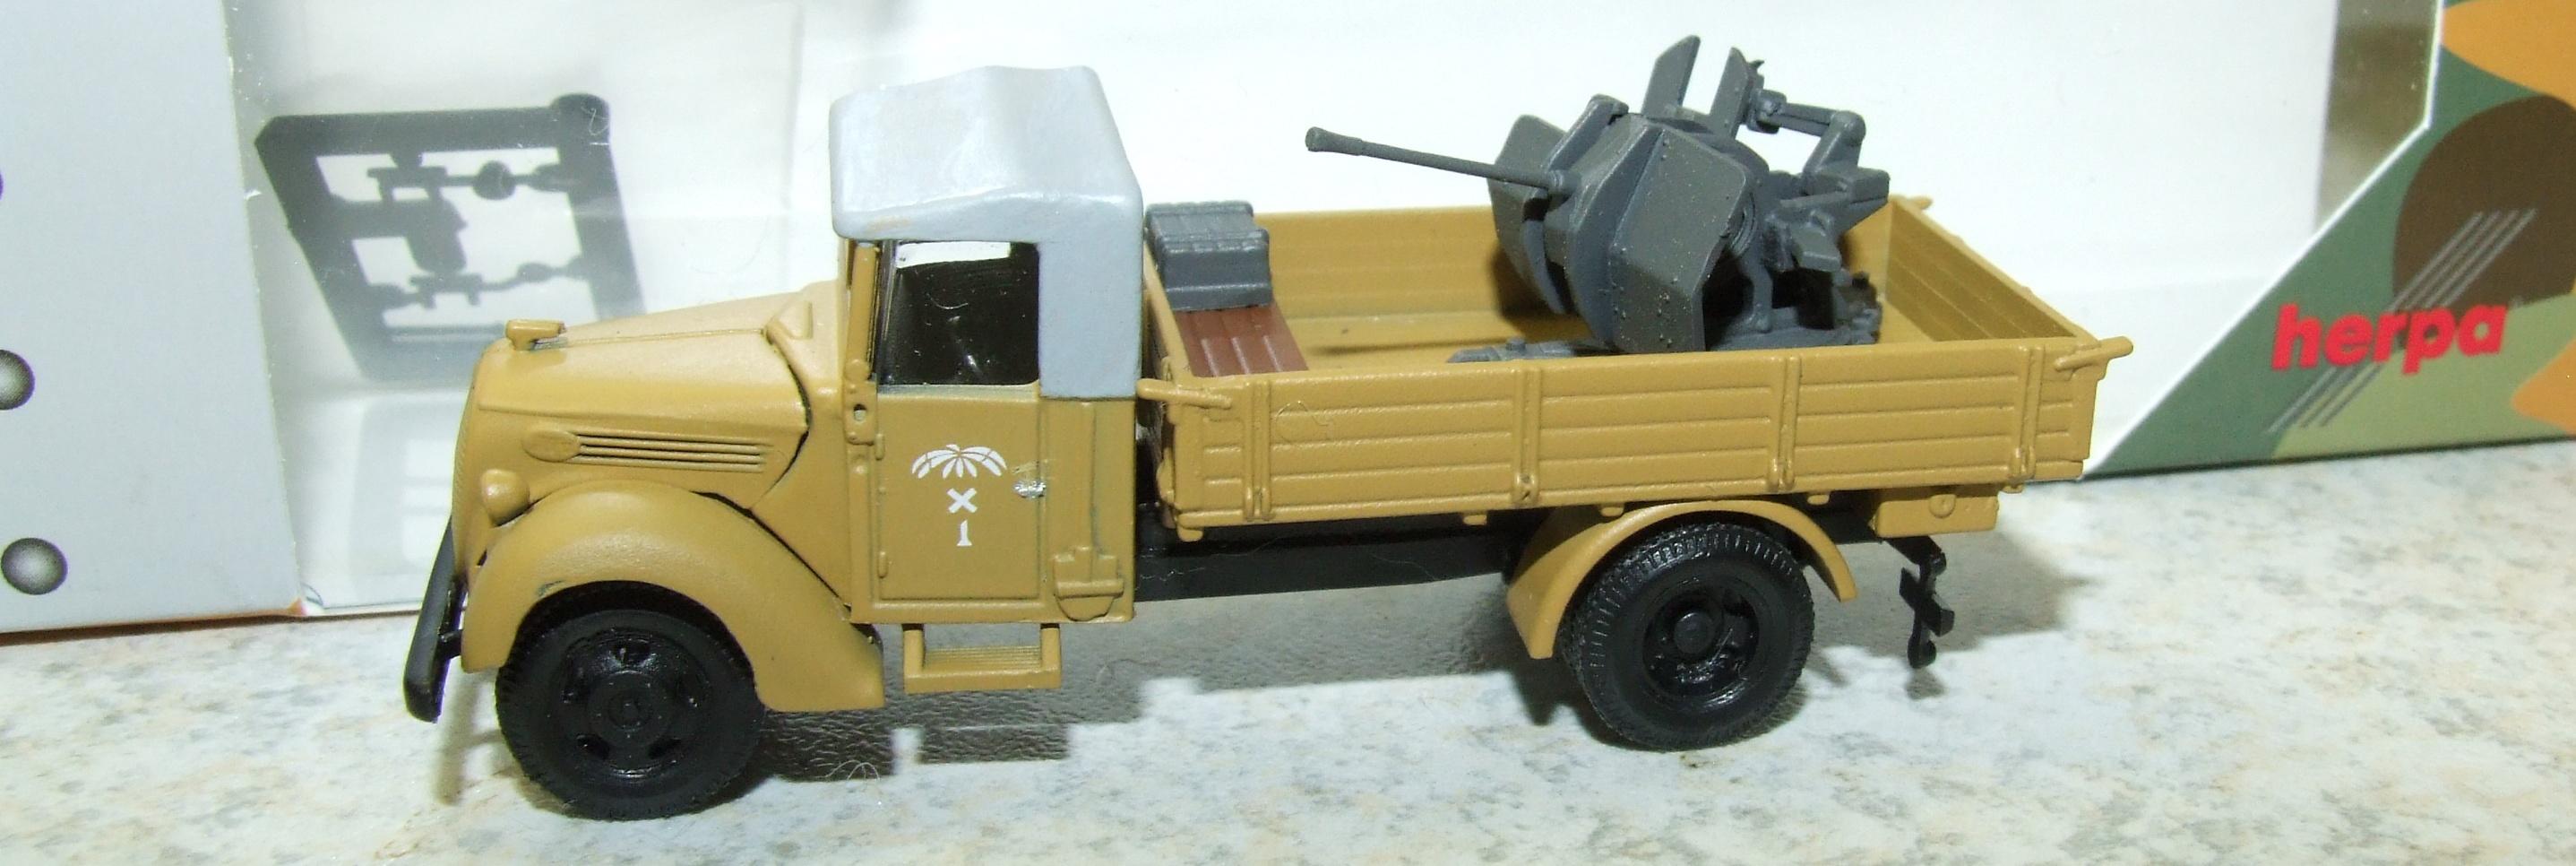 Herpa 746106 Miltary Ford 997 mit FLAK DAK 1:87